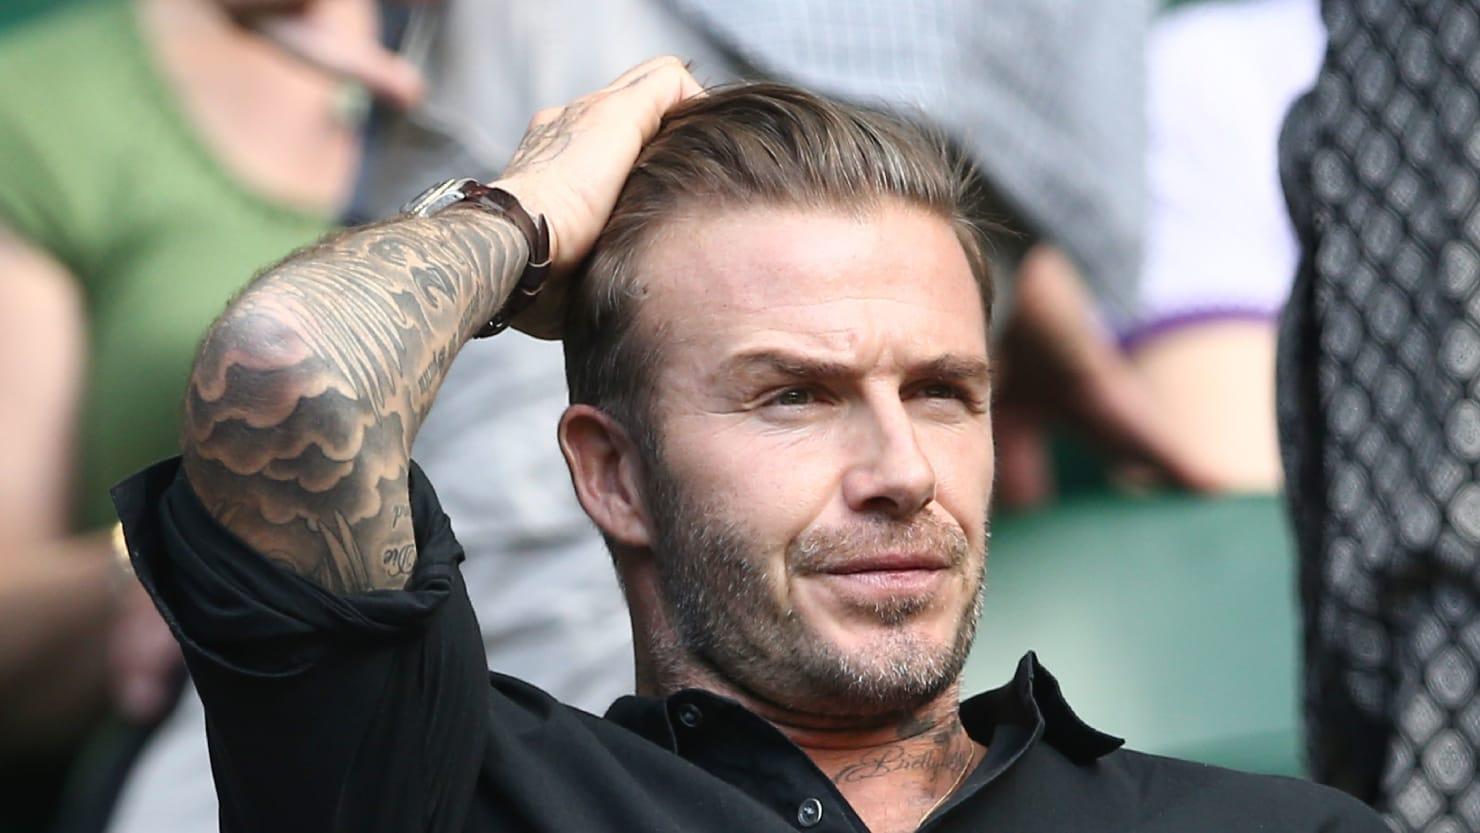 Stolen Emails Expose David Beckham's Darker Side